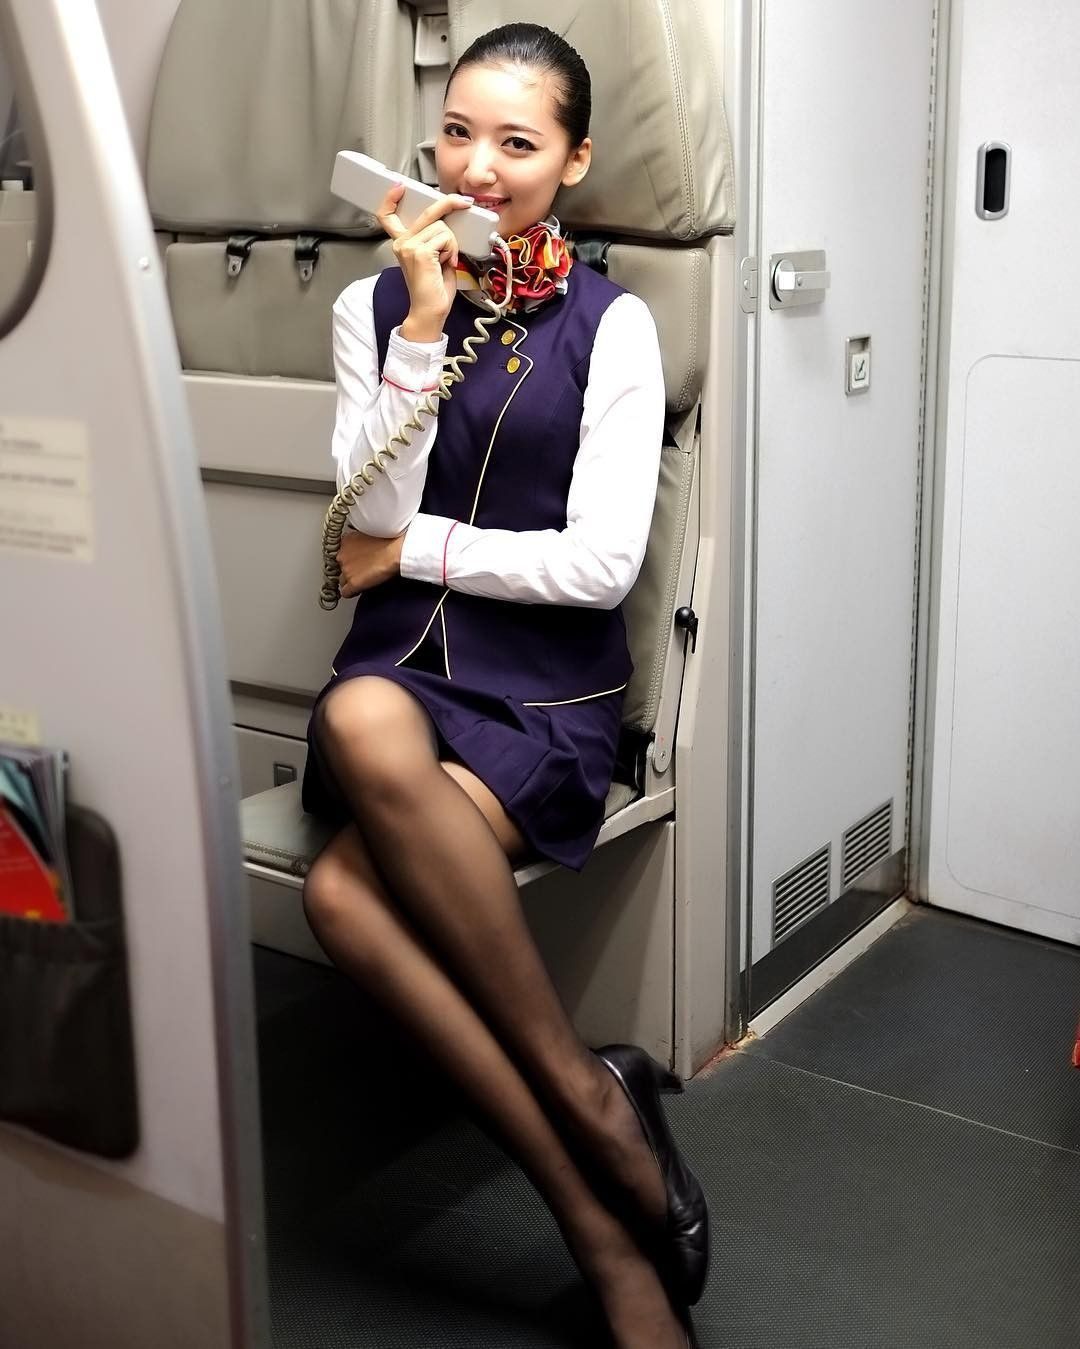 glamour-stewardess-pictures-japanese-pop-star-flashing